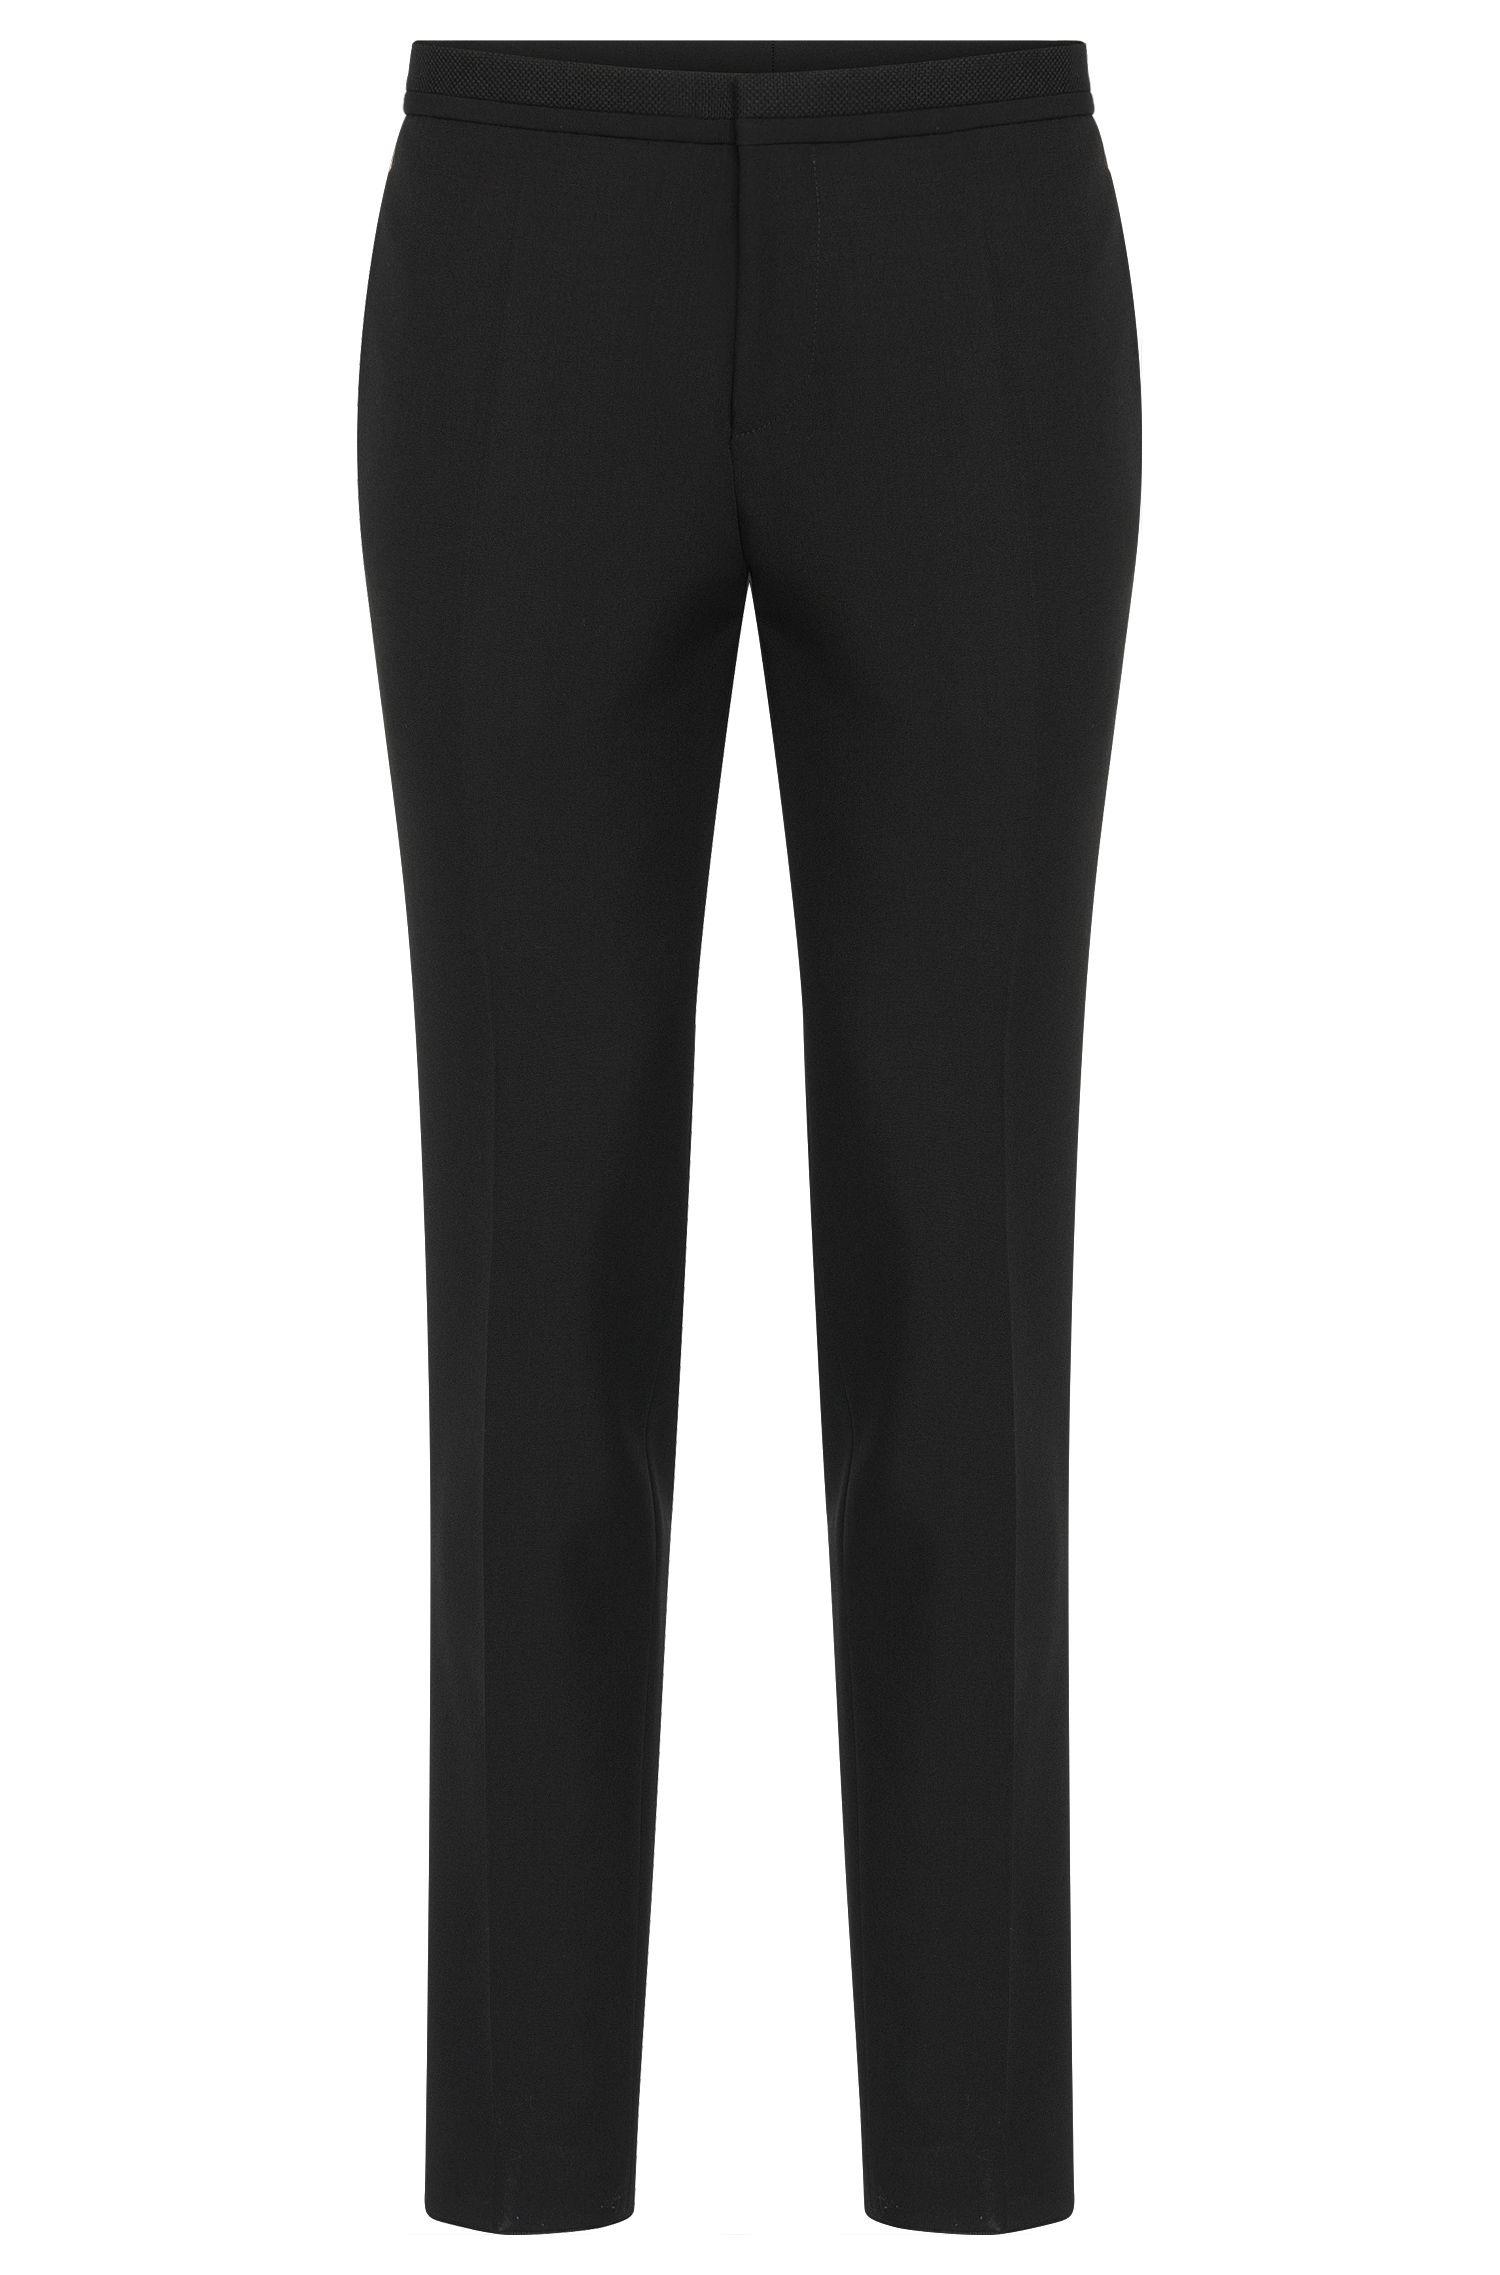 Virgin Wool Mohair Dress Pants, Extra Slim Fit | Wynn, Black